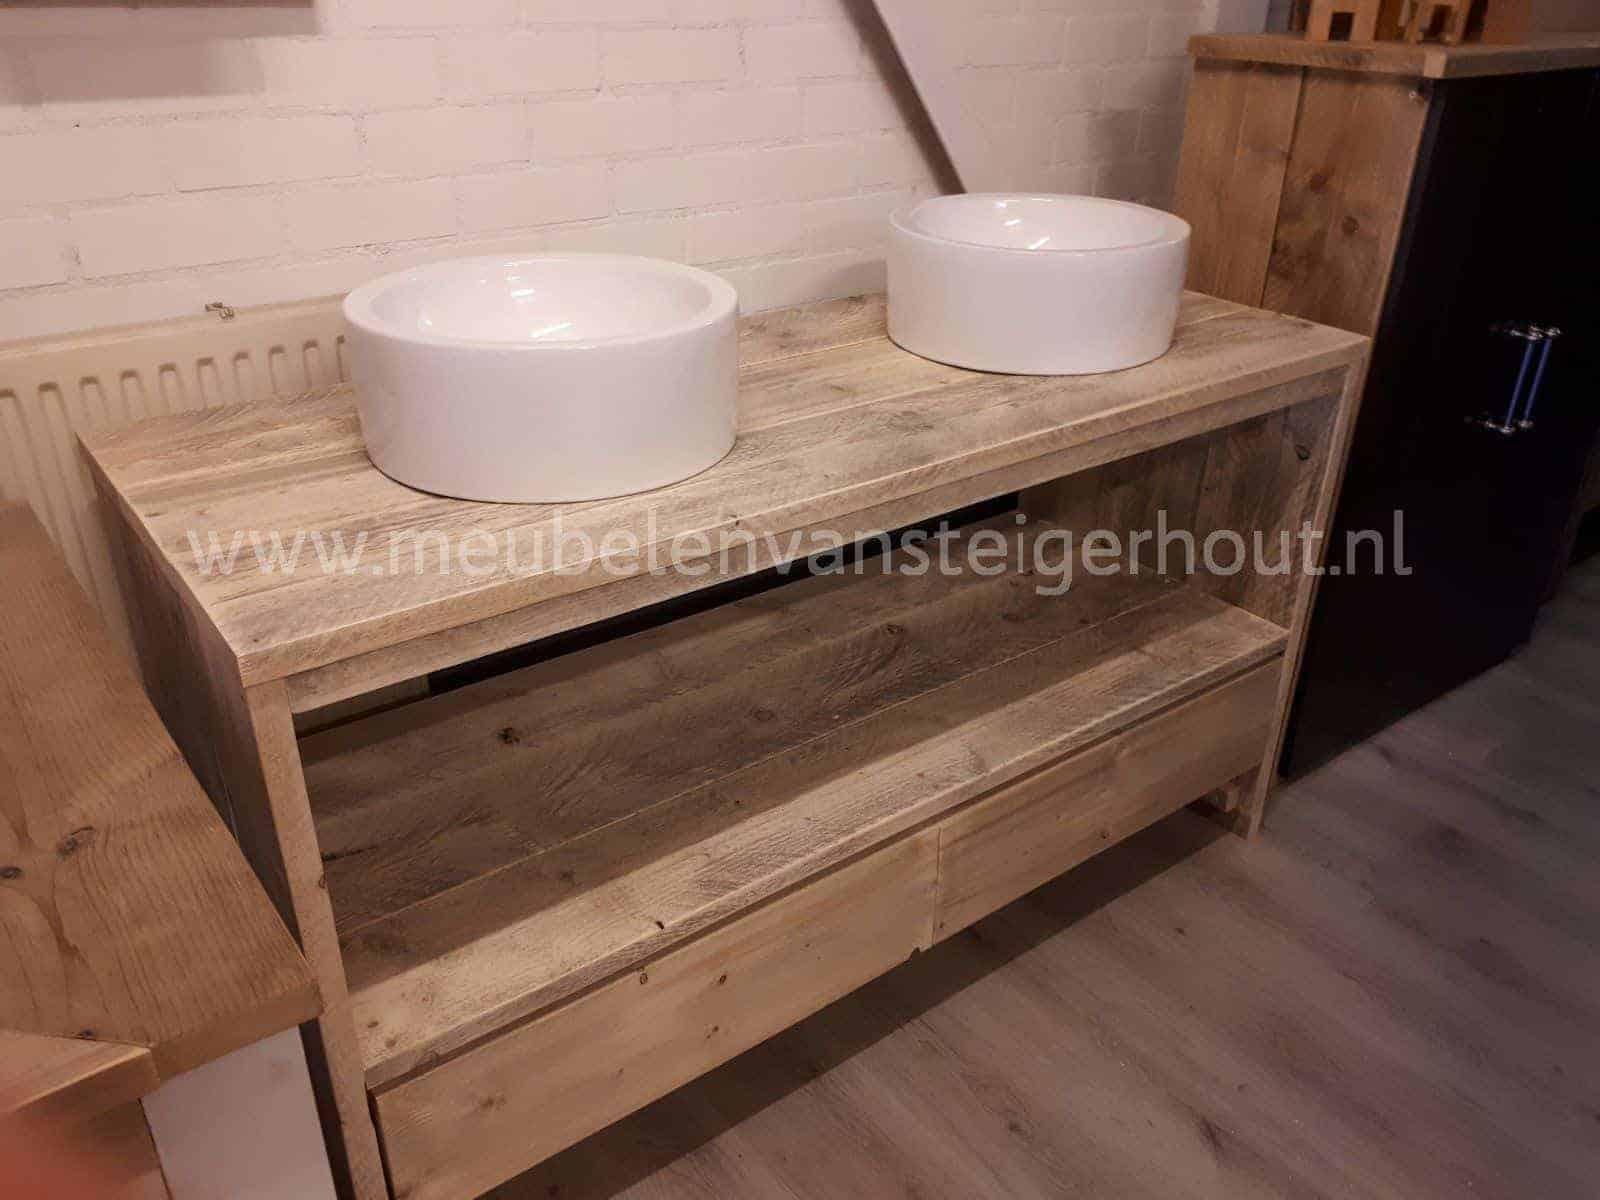 Steigerhouten badkamermeubel gratis bezorgd